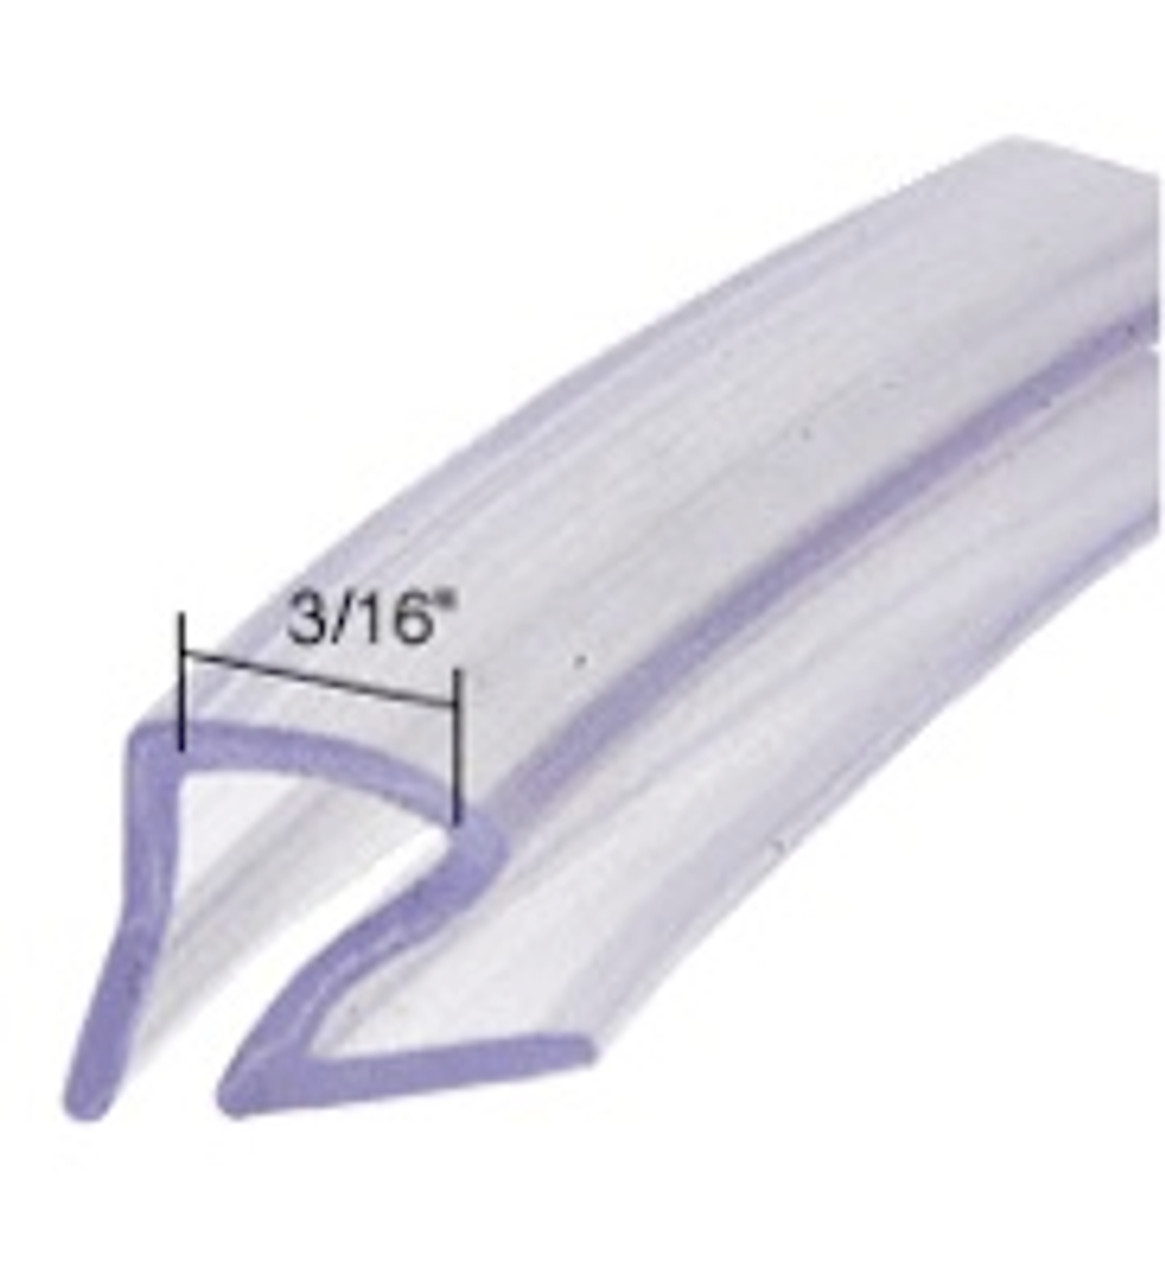 Clear Jalousie Window Vinyl Seal (CHW065)